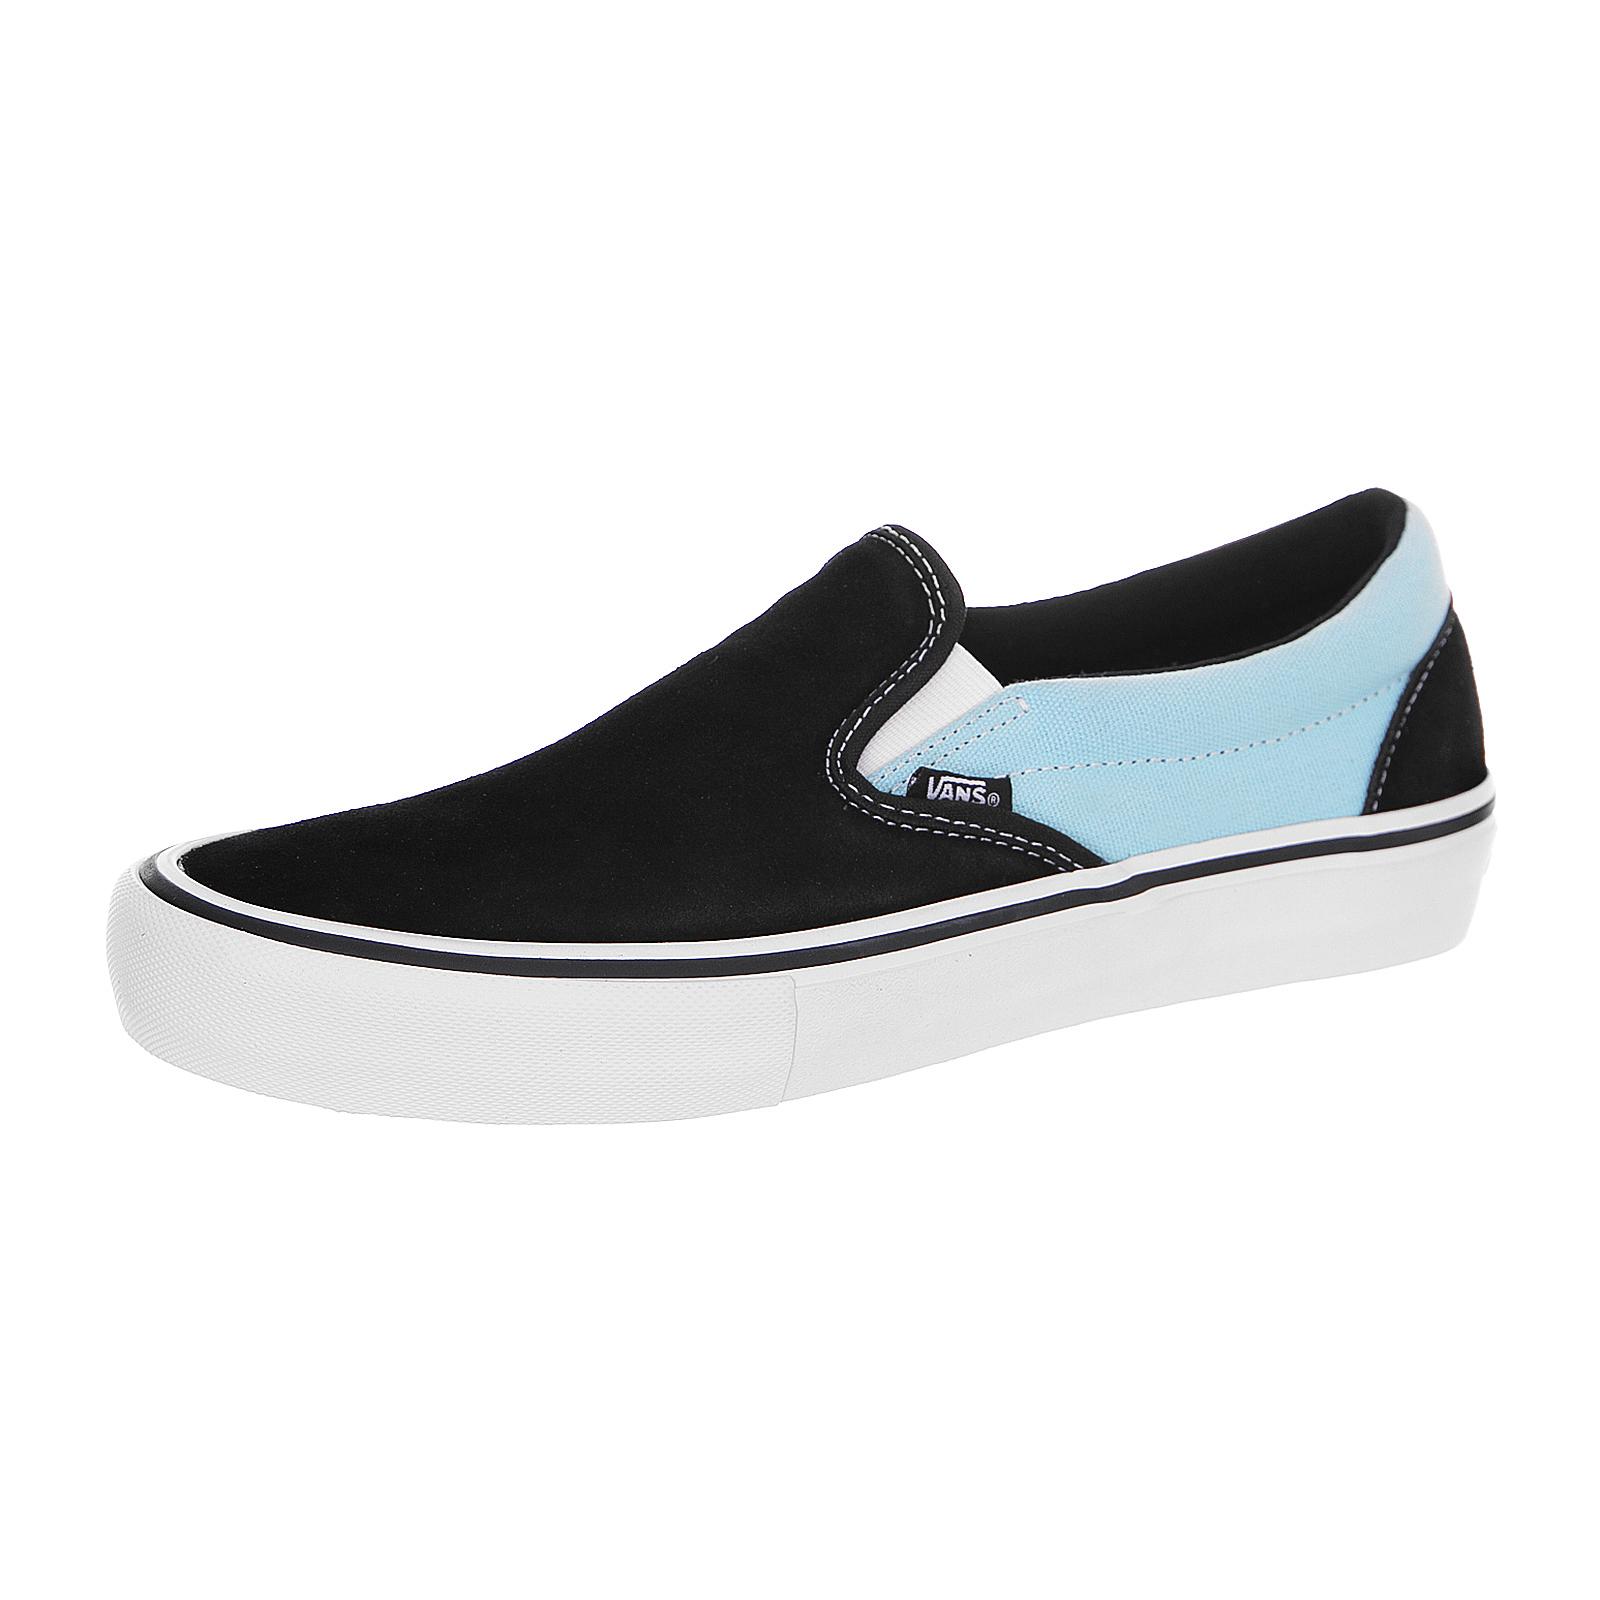 Vans Sneakers Slip-On Pro (Asymmetry) Noir / Bleu / Rose Nero